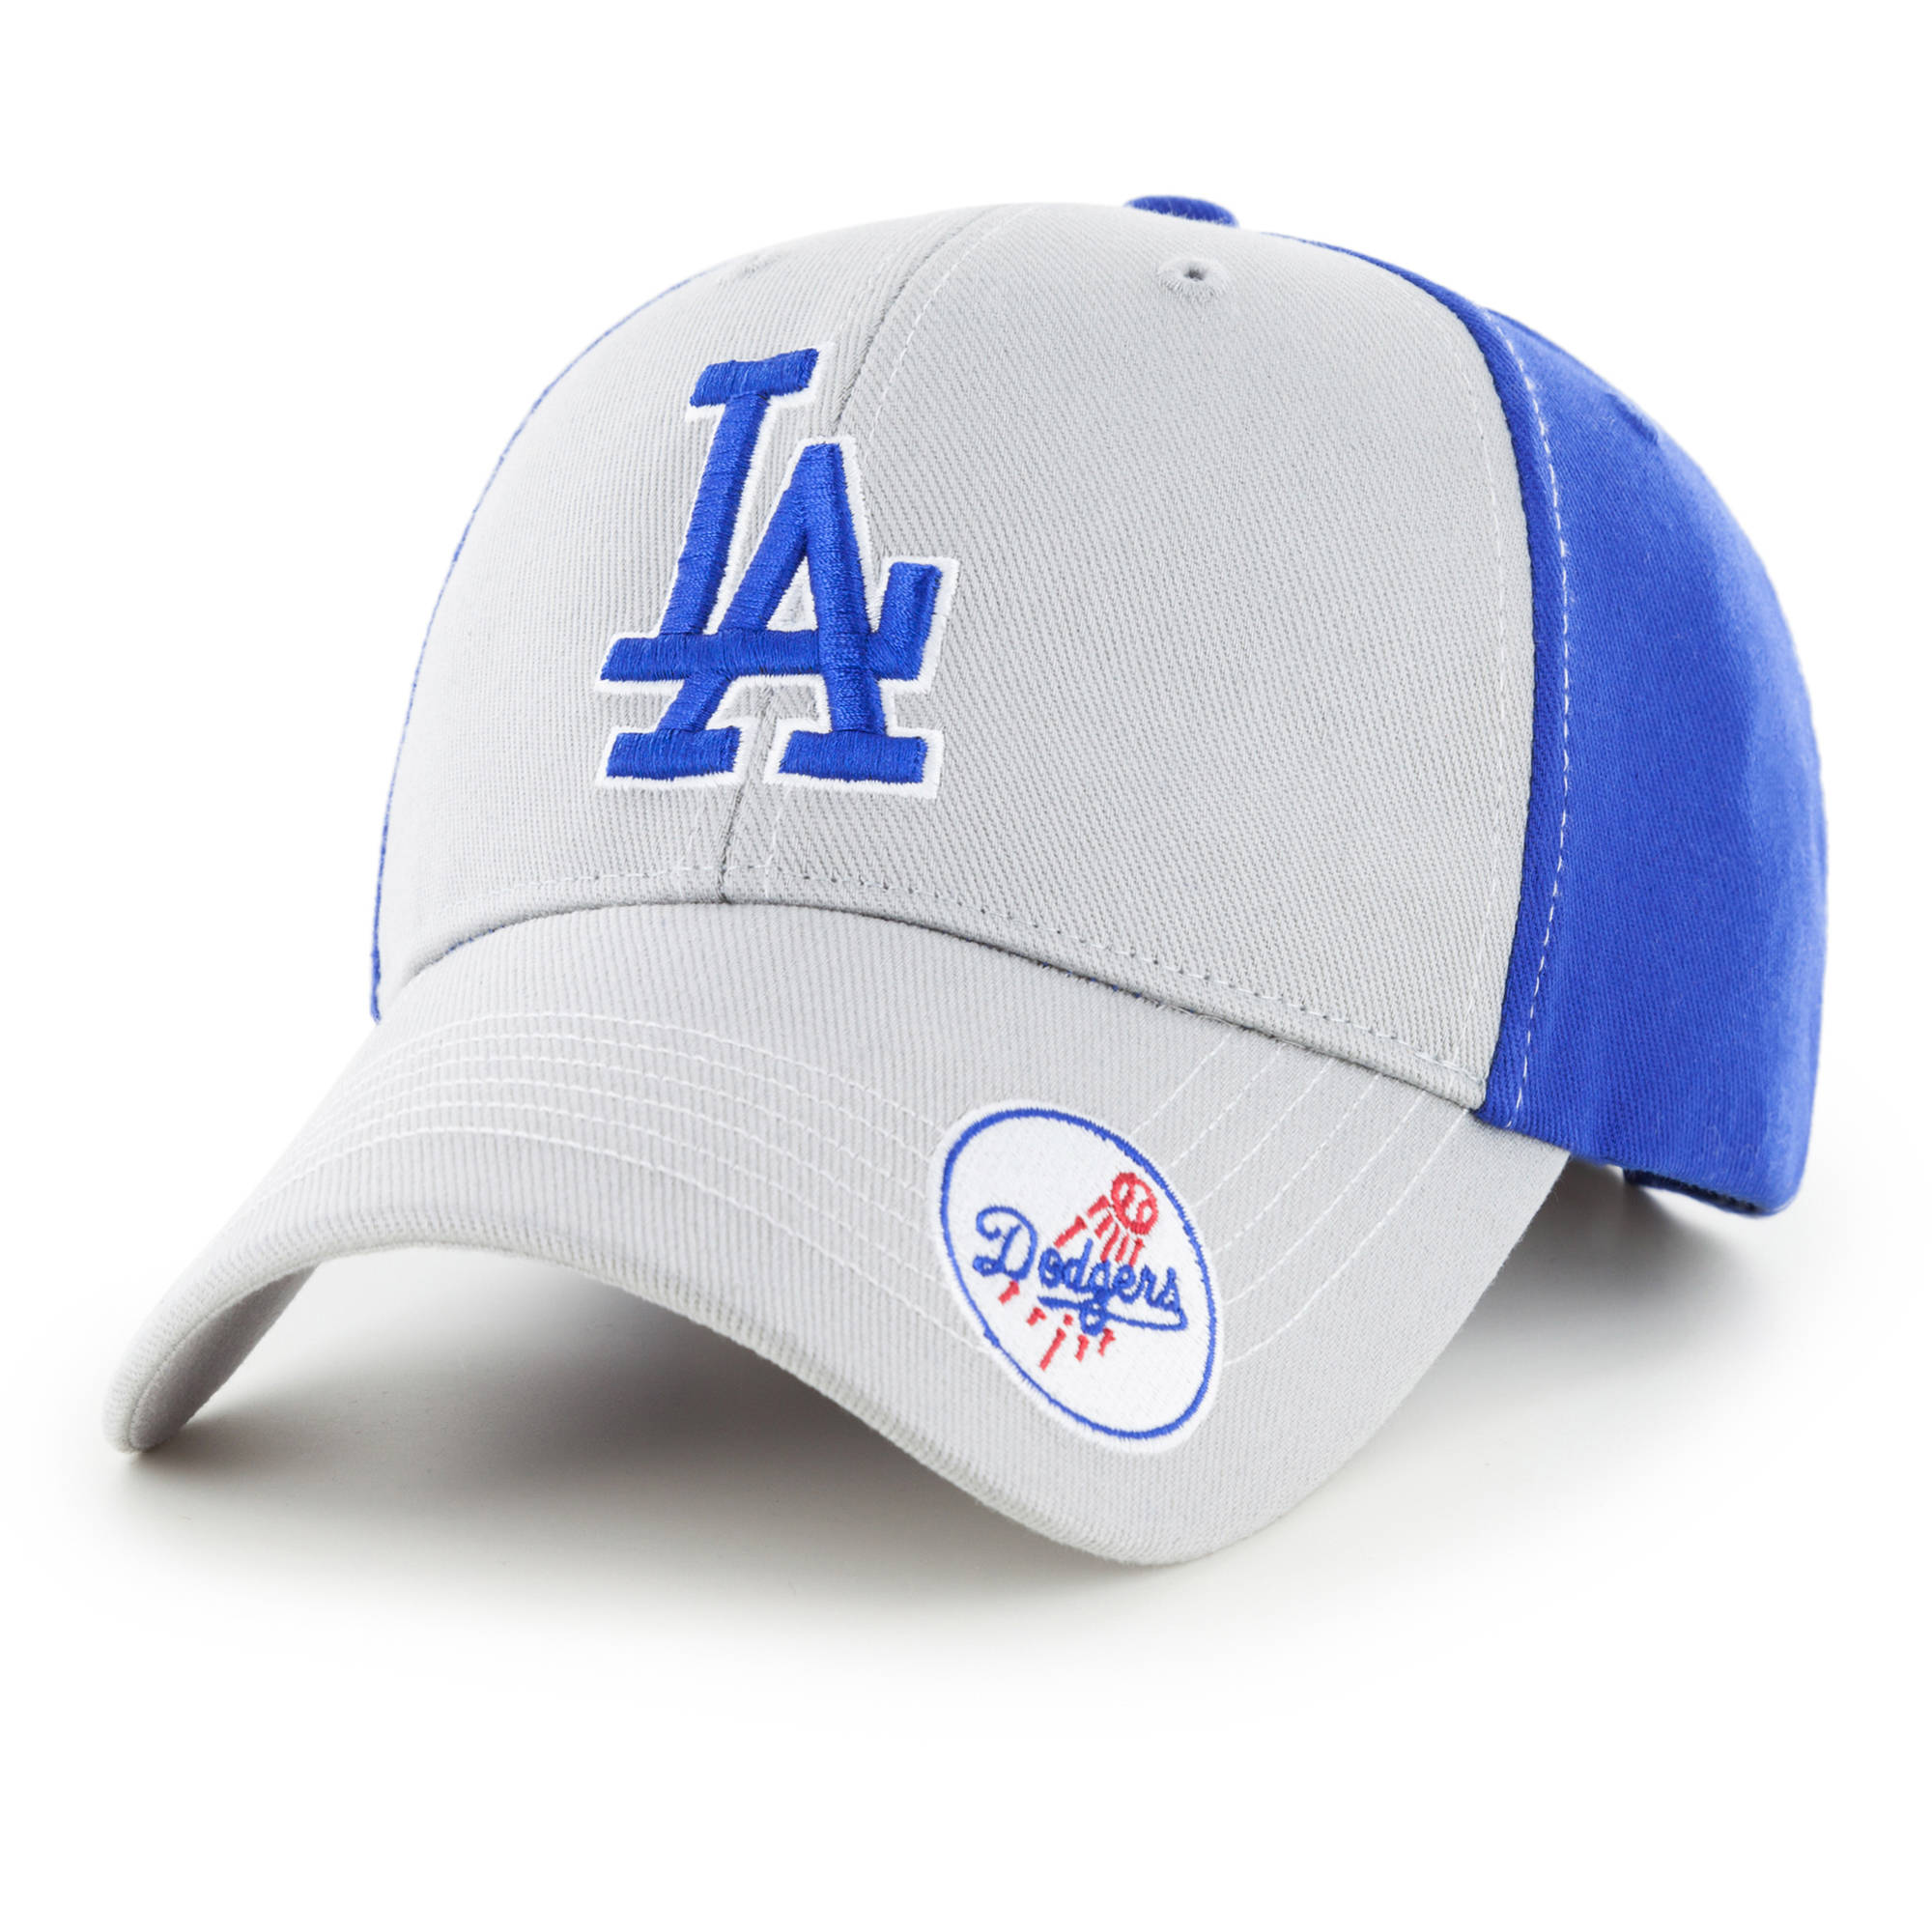 MLB Los Angeles Dodgers Revolver Cap / Hat by Fan Favorite